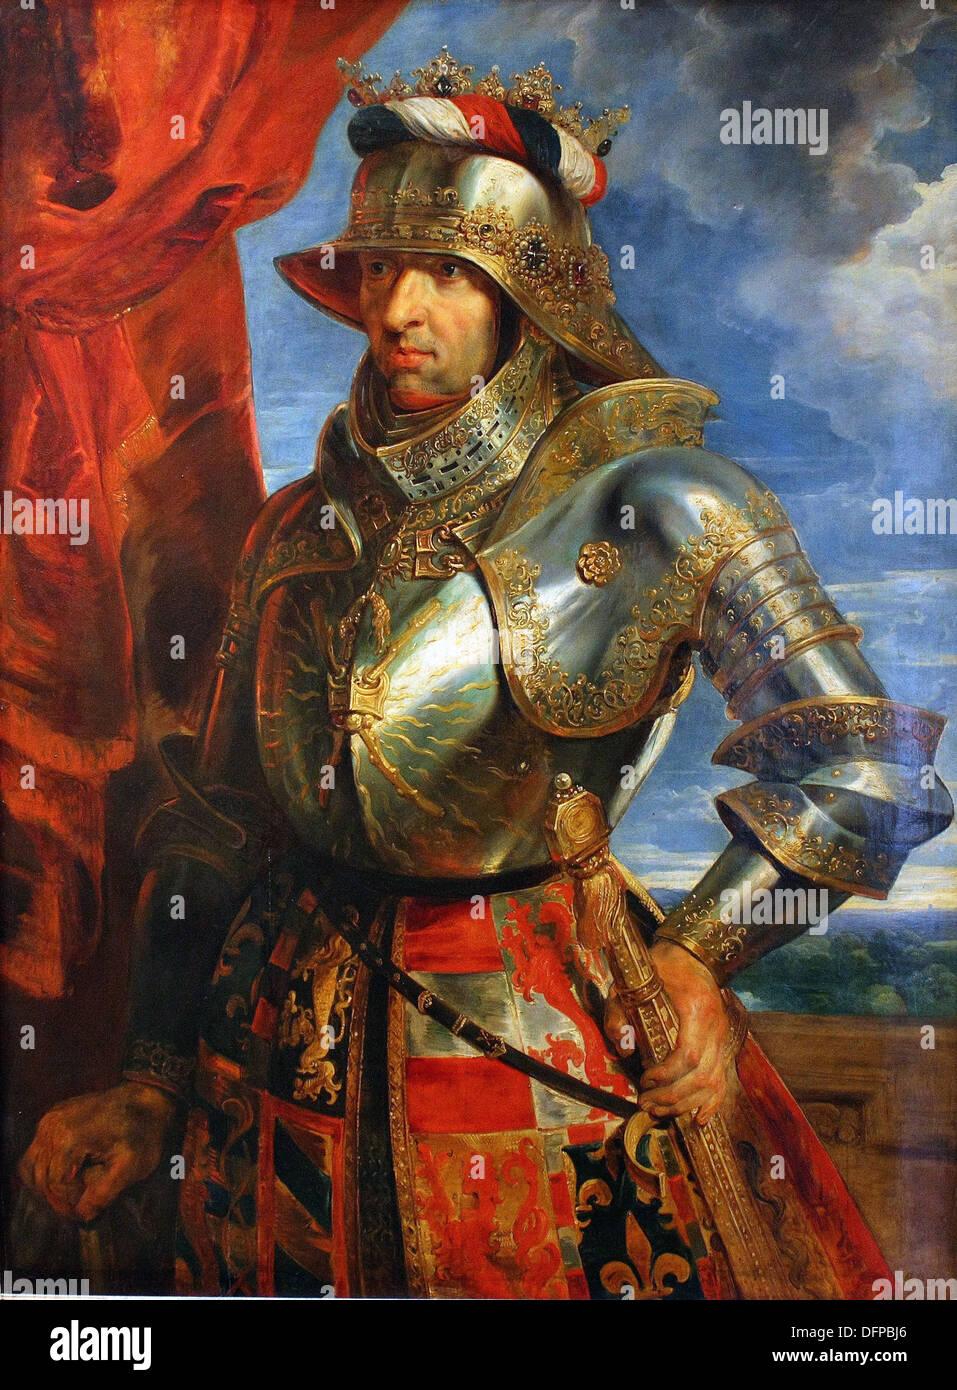 Peter Paul RUBENS - Emperor Maxmilian I - 1618 - Kunsthistoriches Museum - Vienna - Stock Image